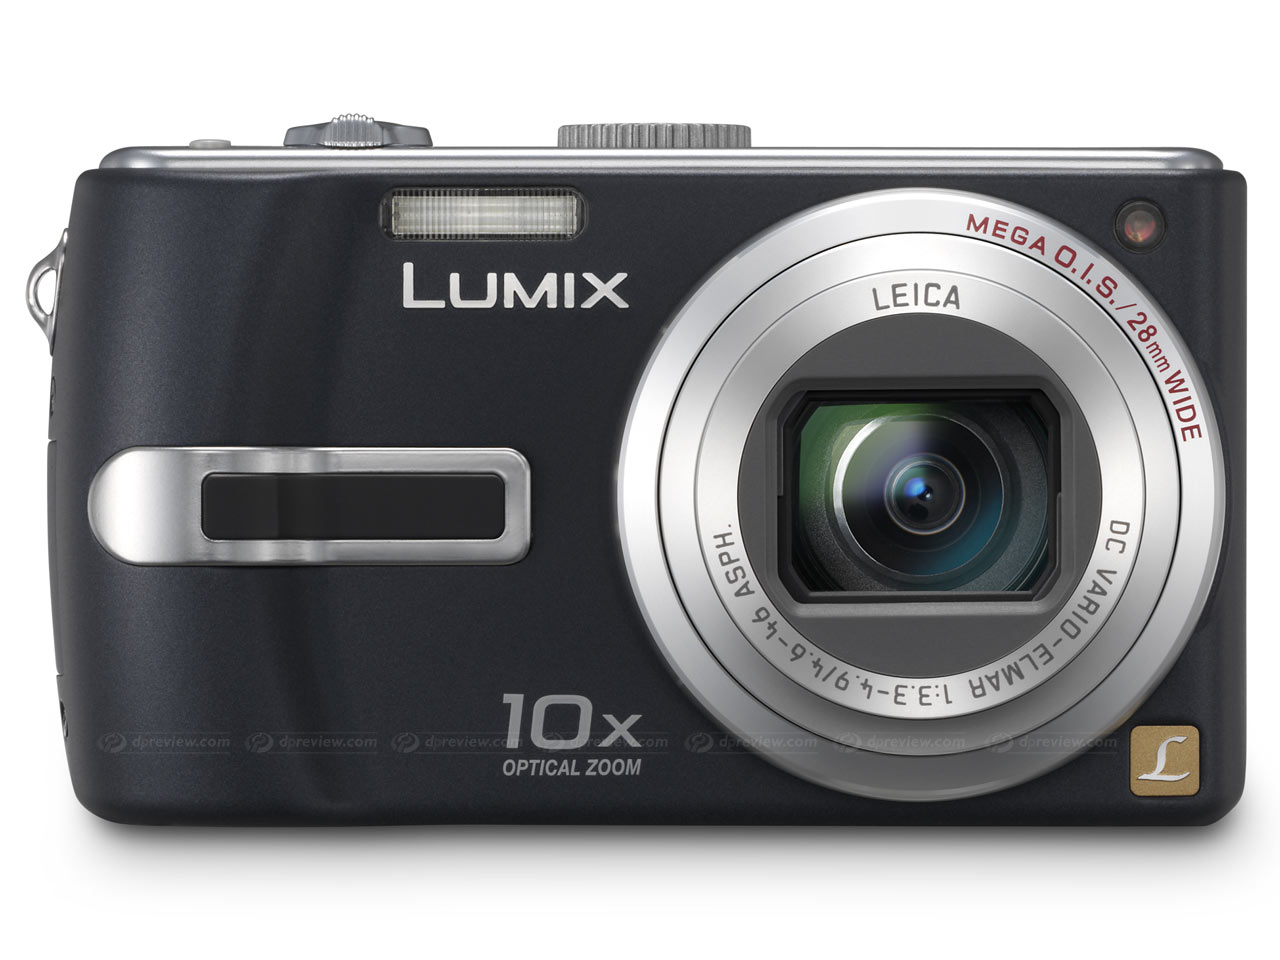 panasonic lumix dmc tz2 dmc tz3 digital photography review rh dpreview com Panasonic Lumix DMC -TZ10 Panasonic Lumix DMC ZS3